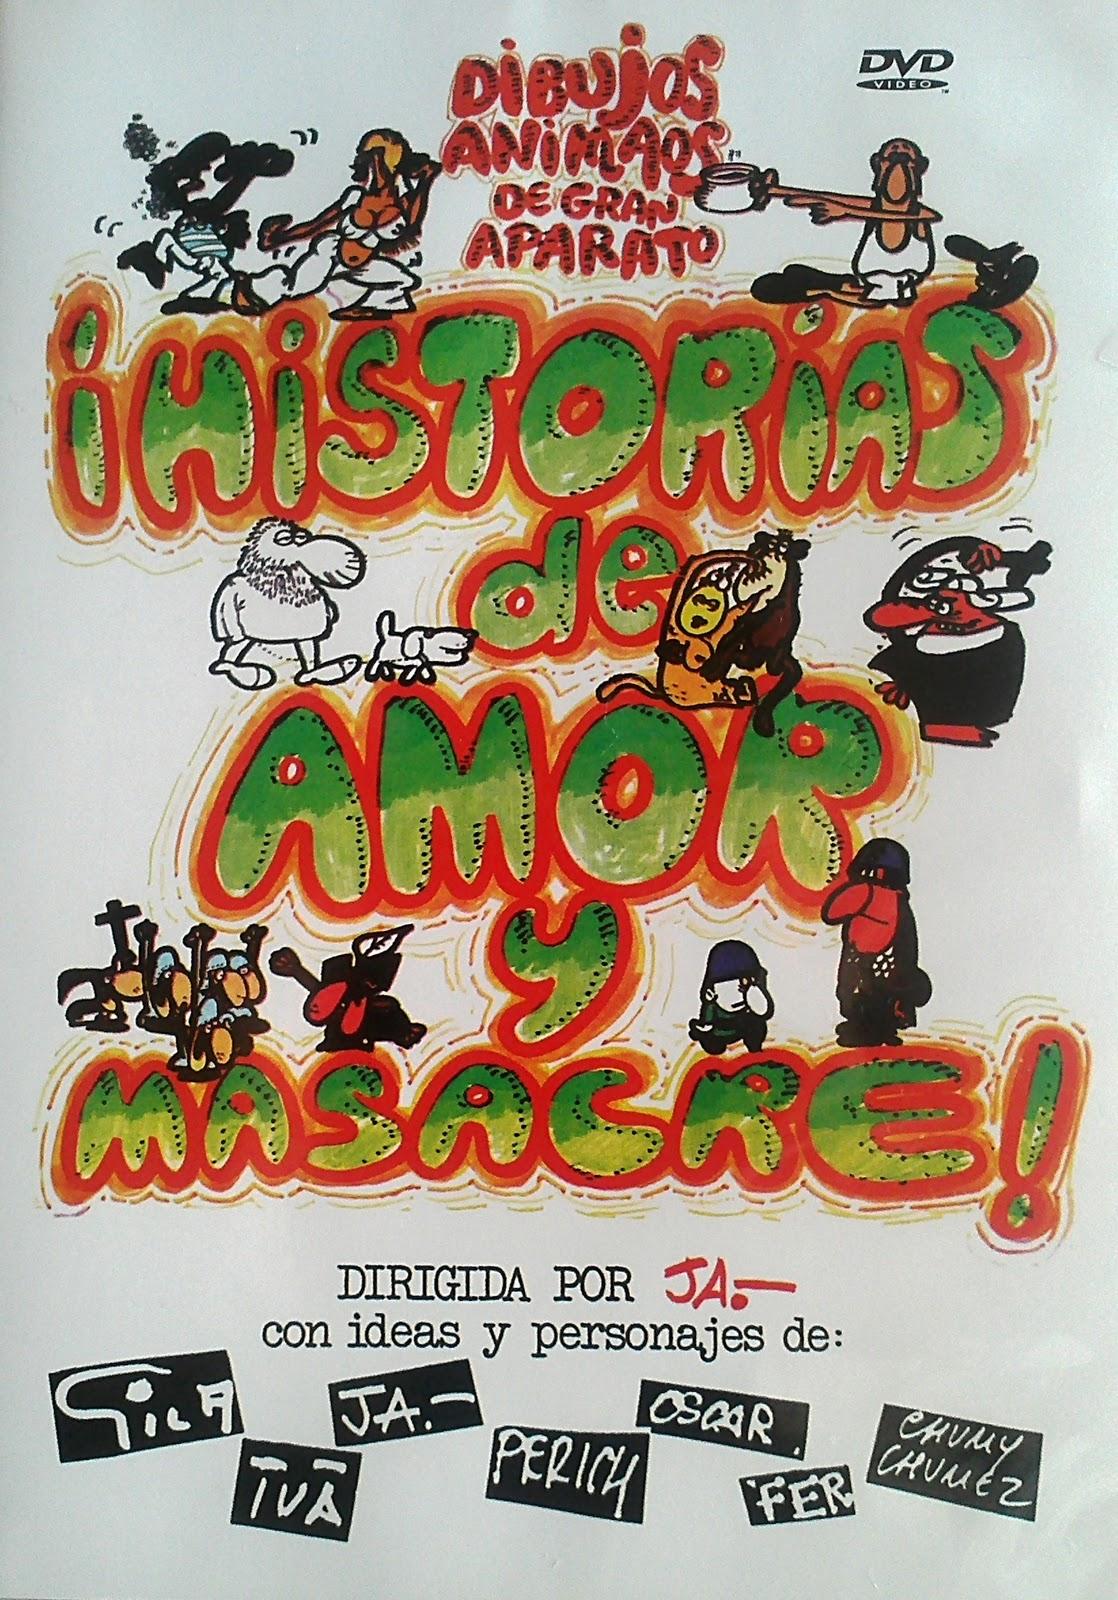 http://descubrepelis.blogspot.com/2012/02/historias-de-amor-y-masacre.html